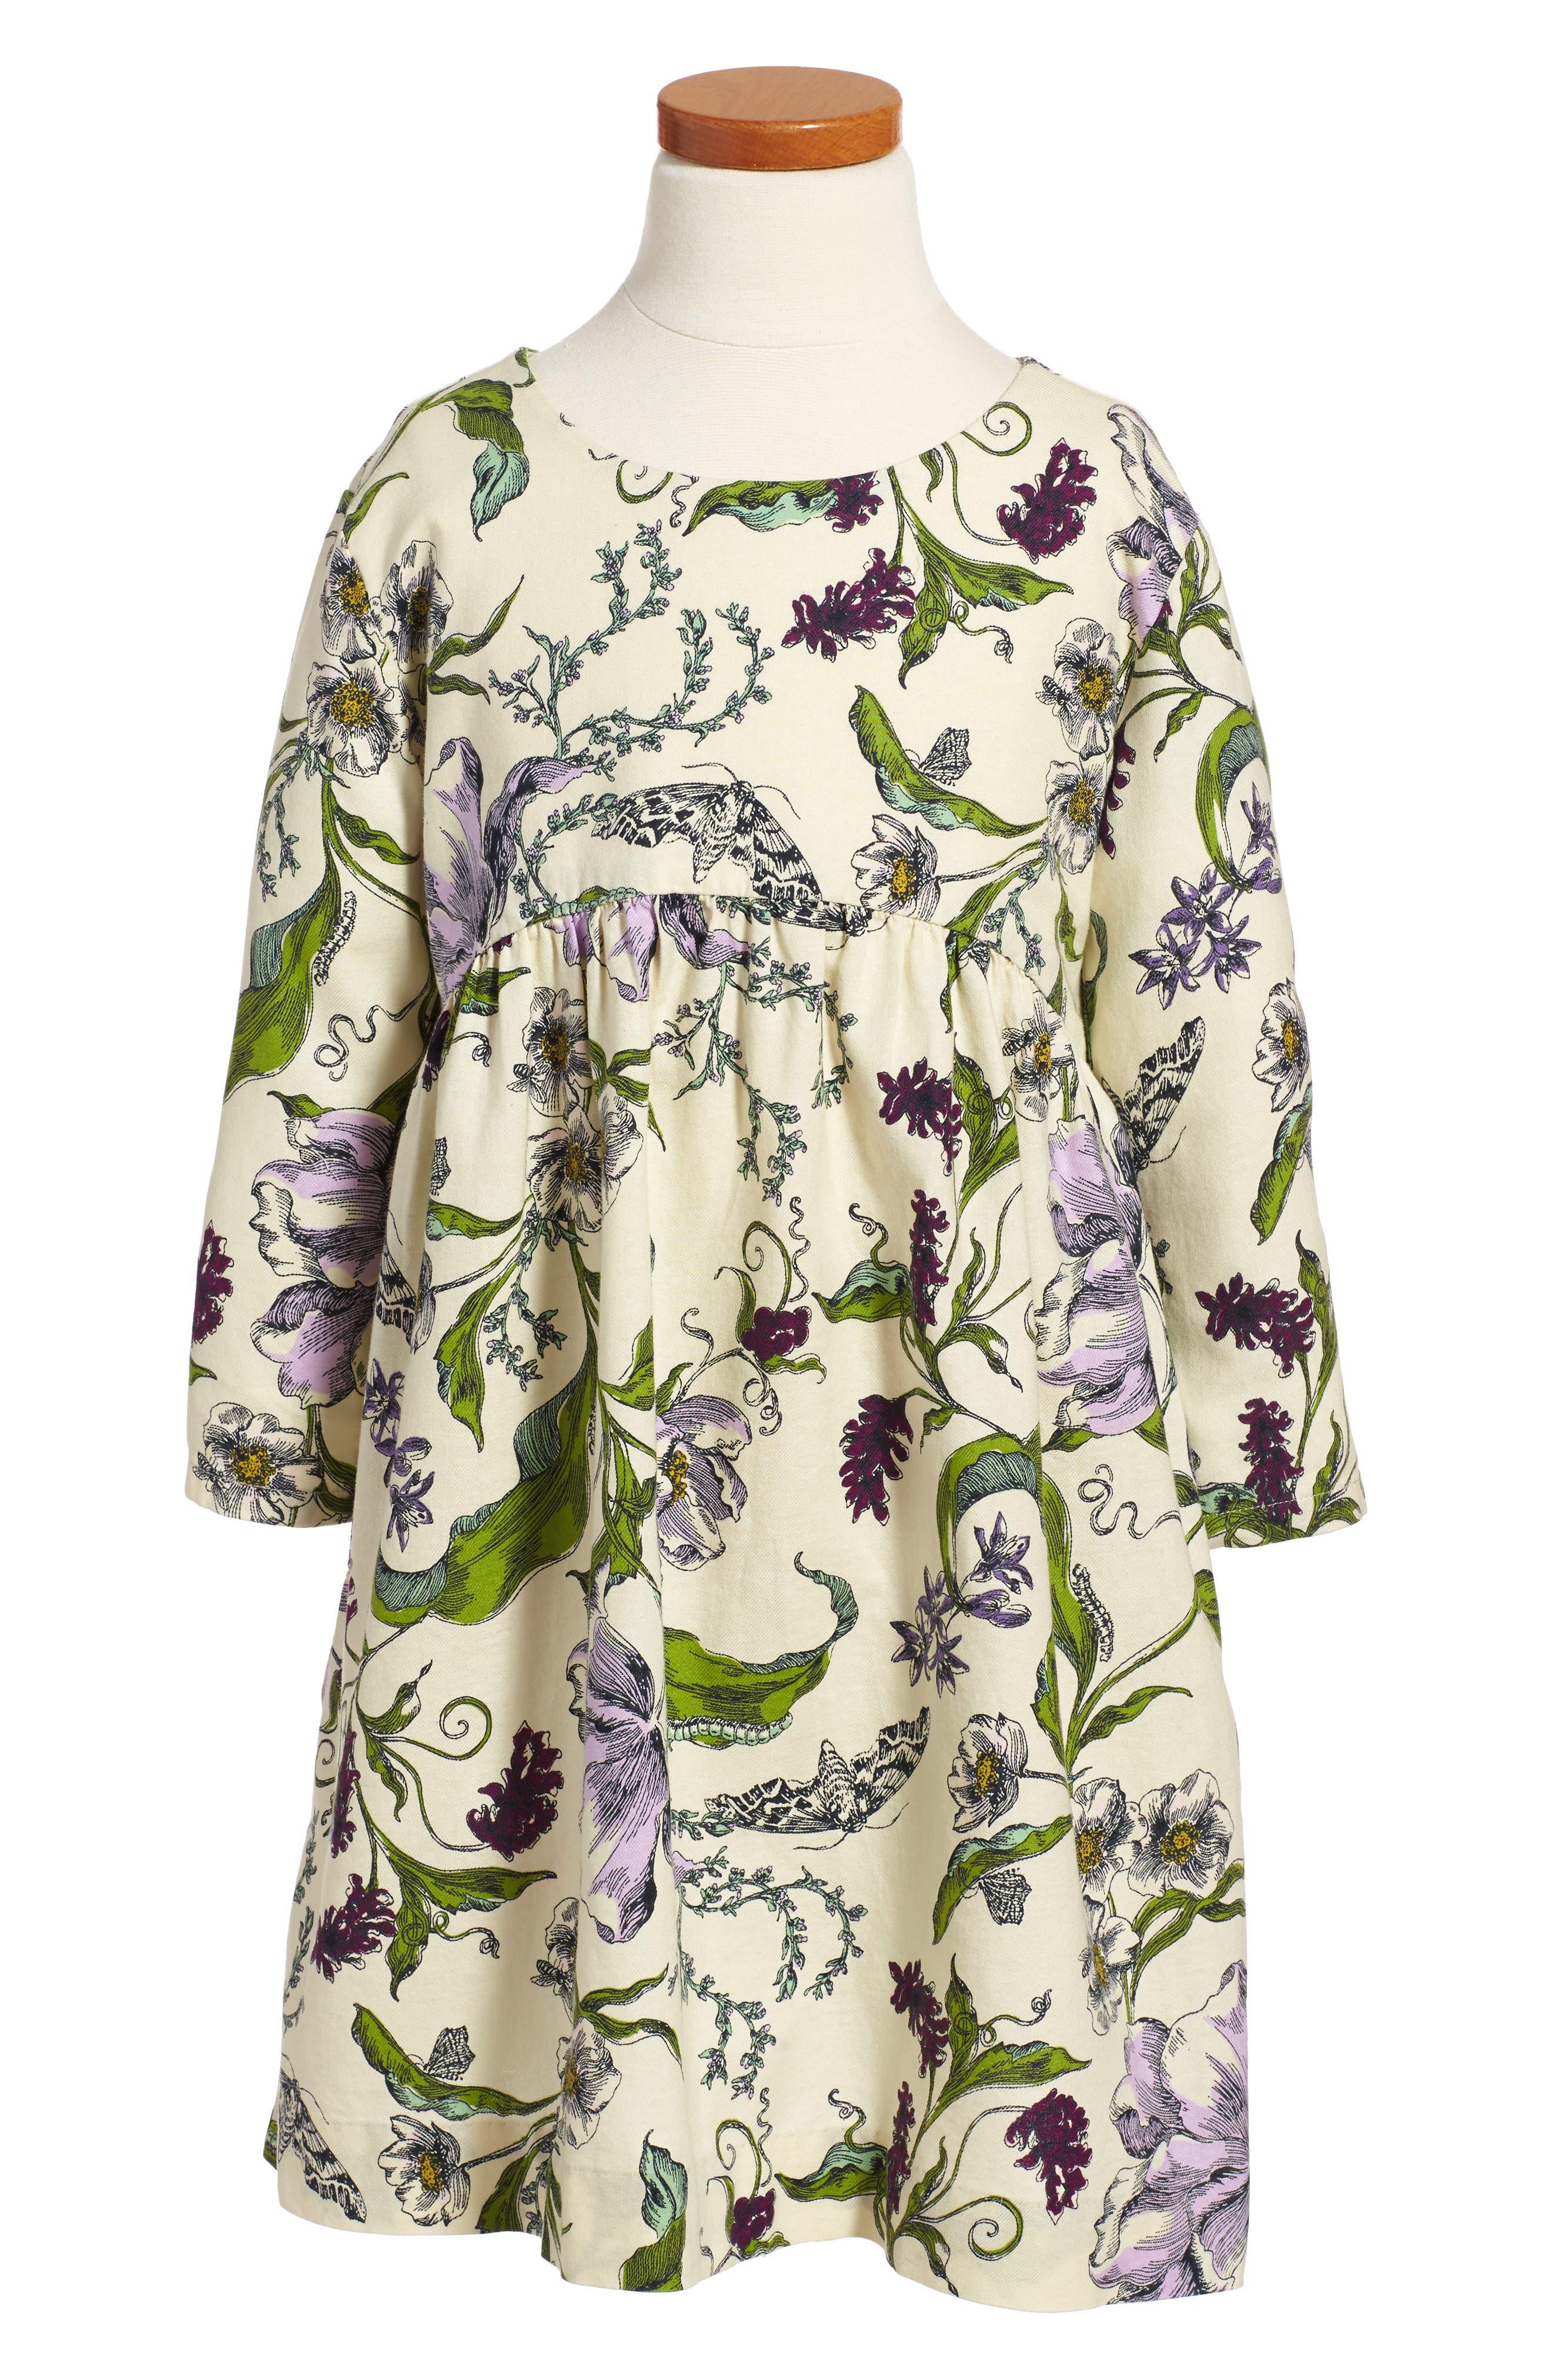 Wallpaper Party Dress,                         Main,                         color, Cream